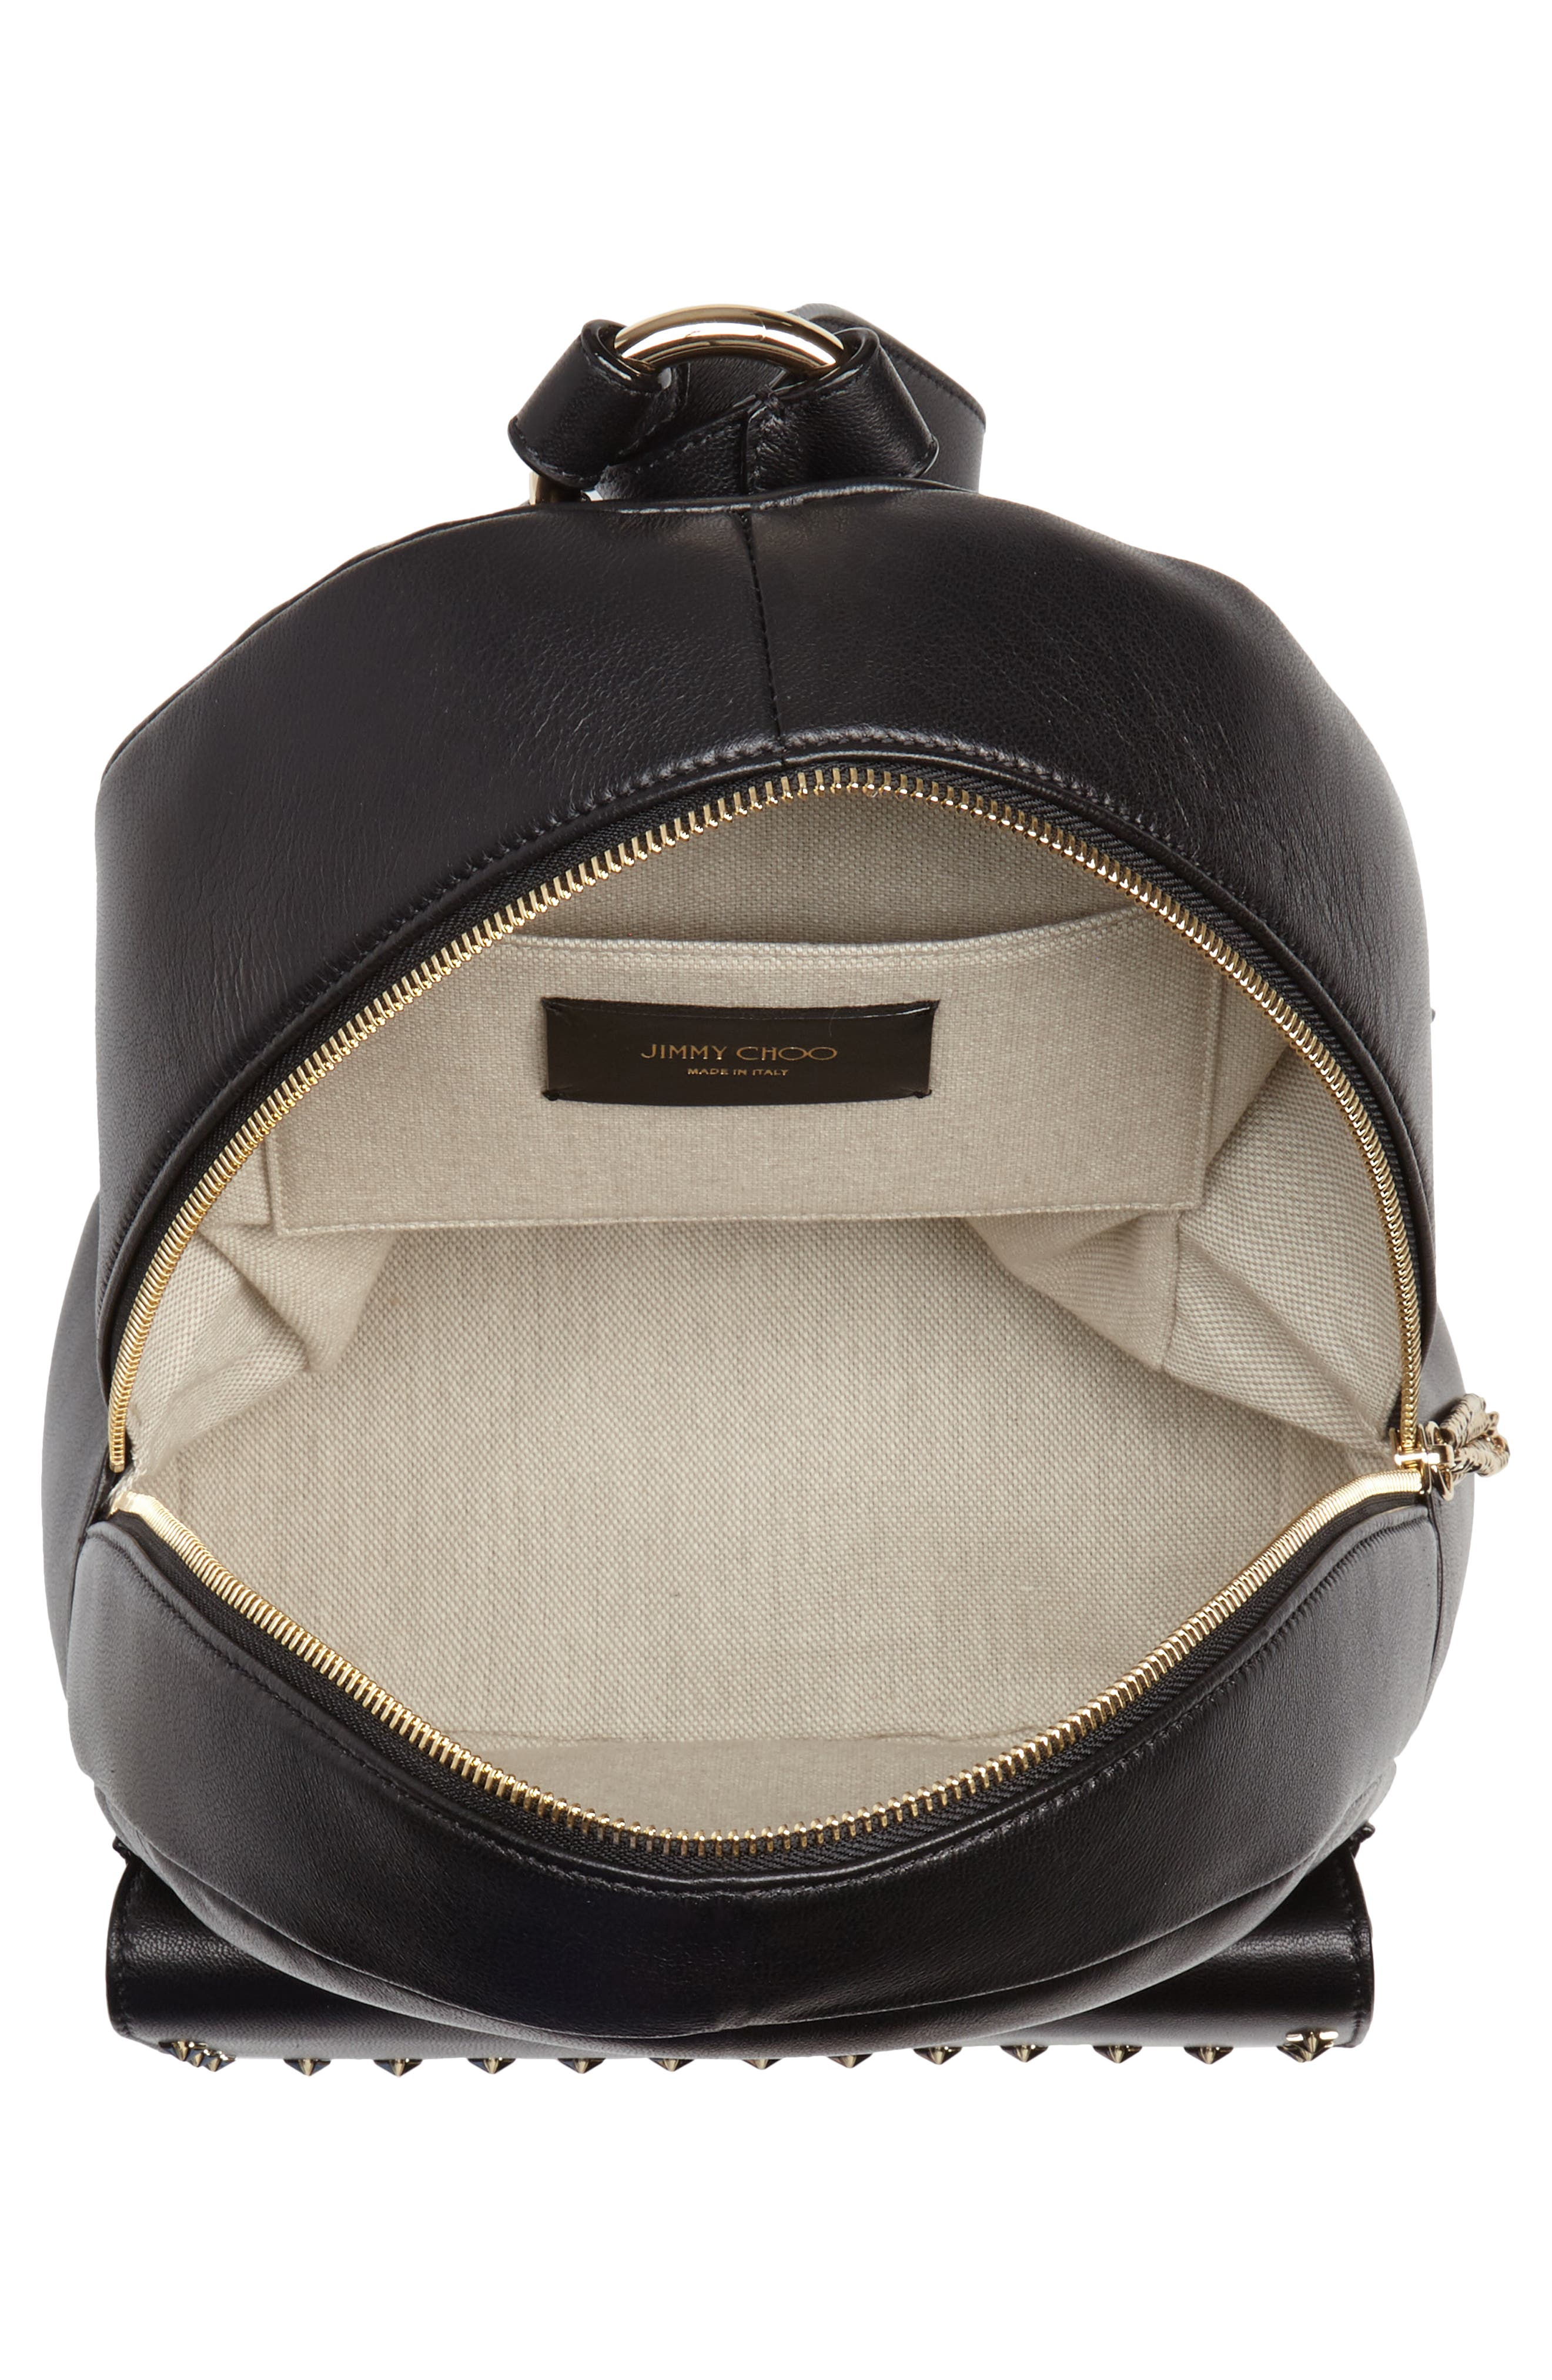 Cassie Star Studded Lambskin Leather Backpack,                             Alternate thumbnail 4, color,                             Black